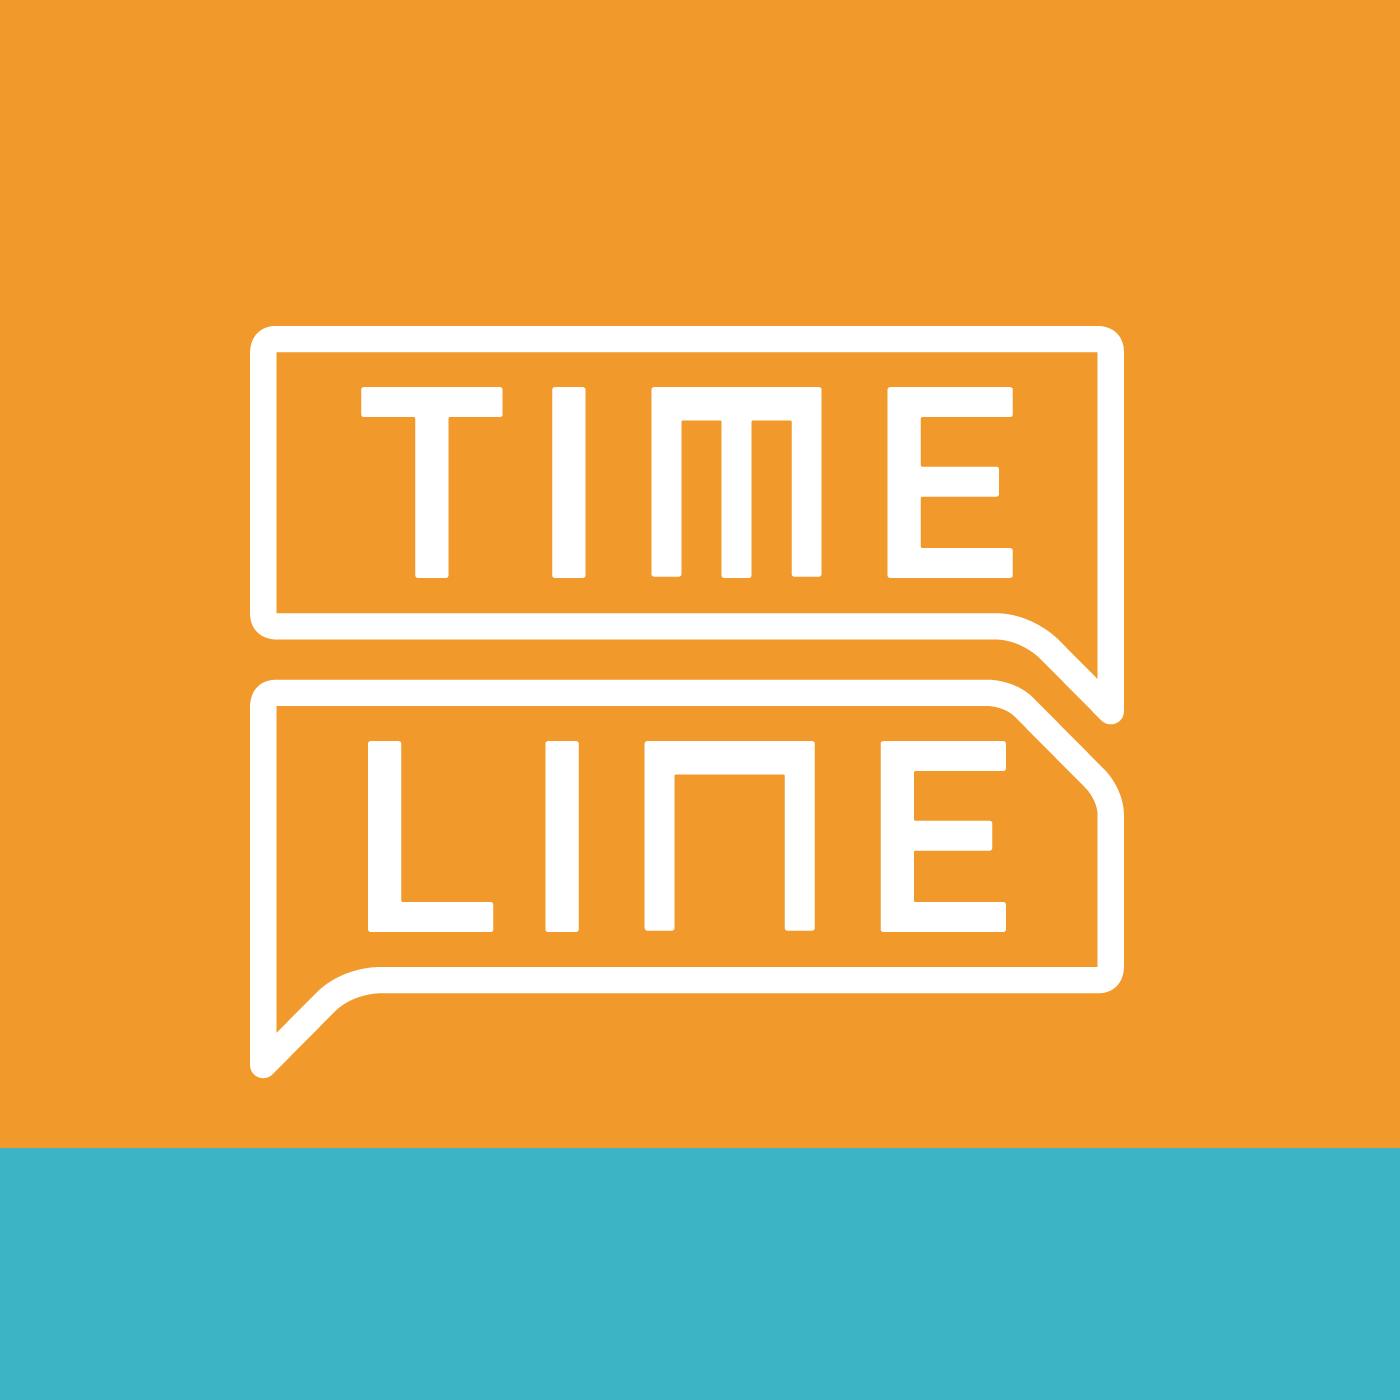 Timeline Gaúcha - 21/07/2016